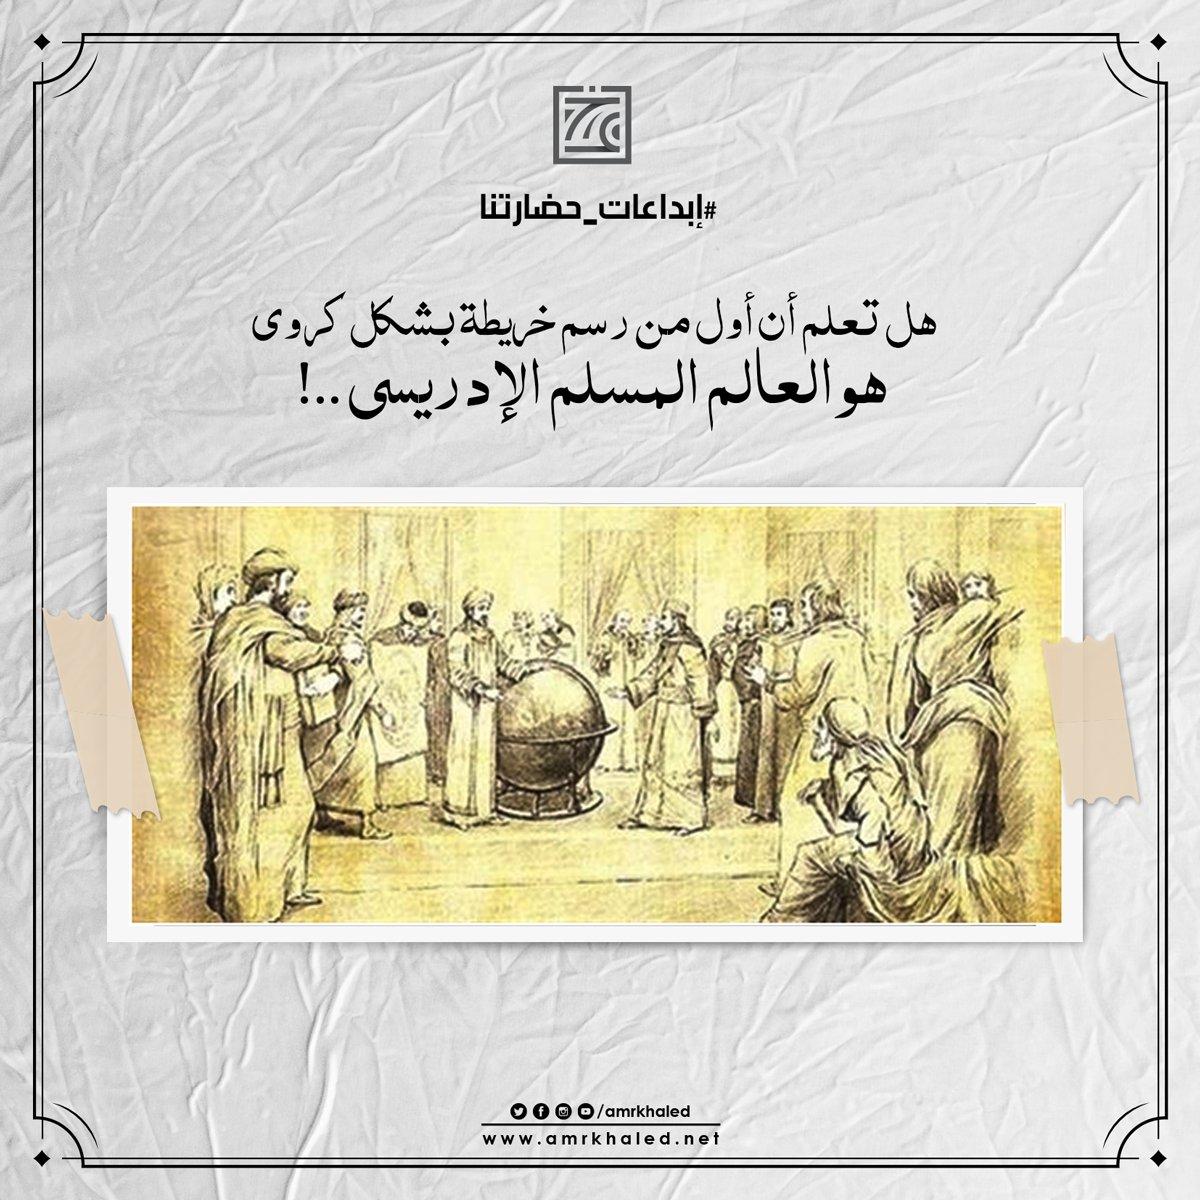 Amr Khaled On Twitter دعوةللإبداع من ابداعاتحضارتنا هل